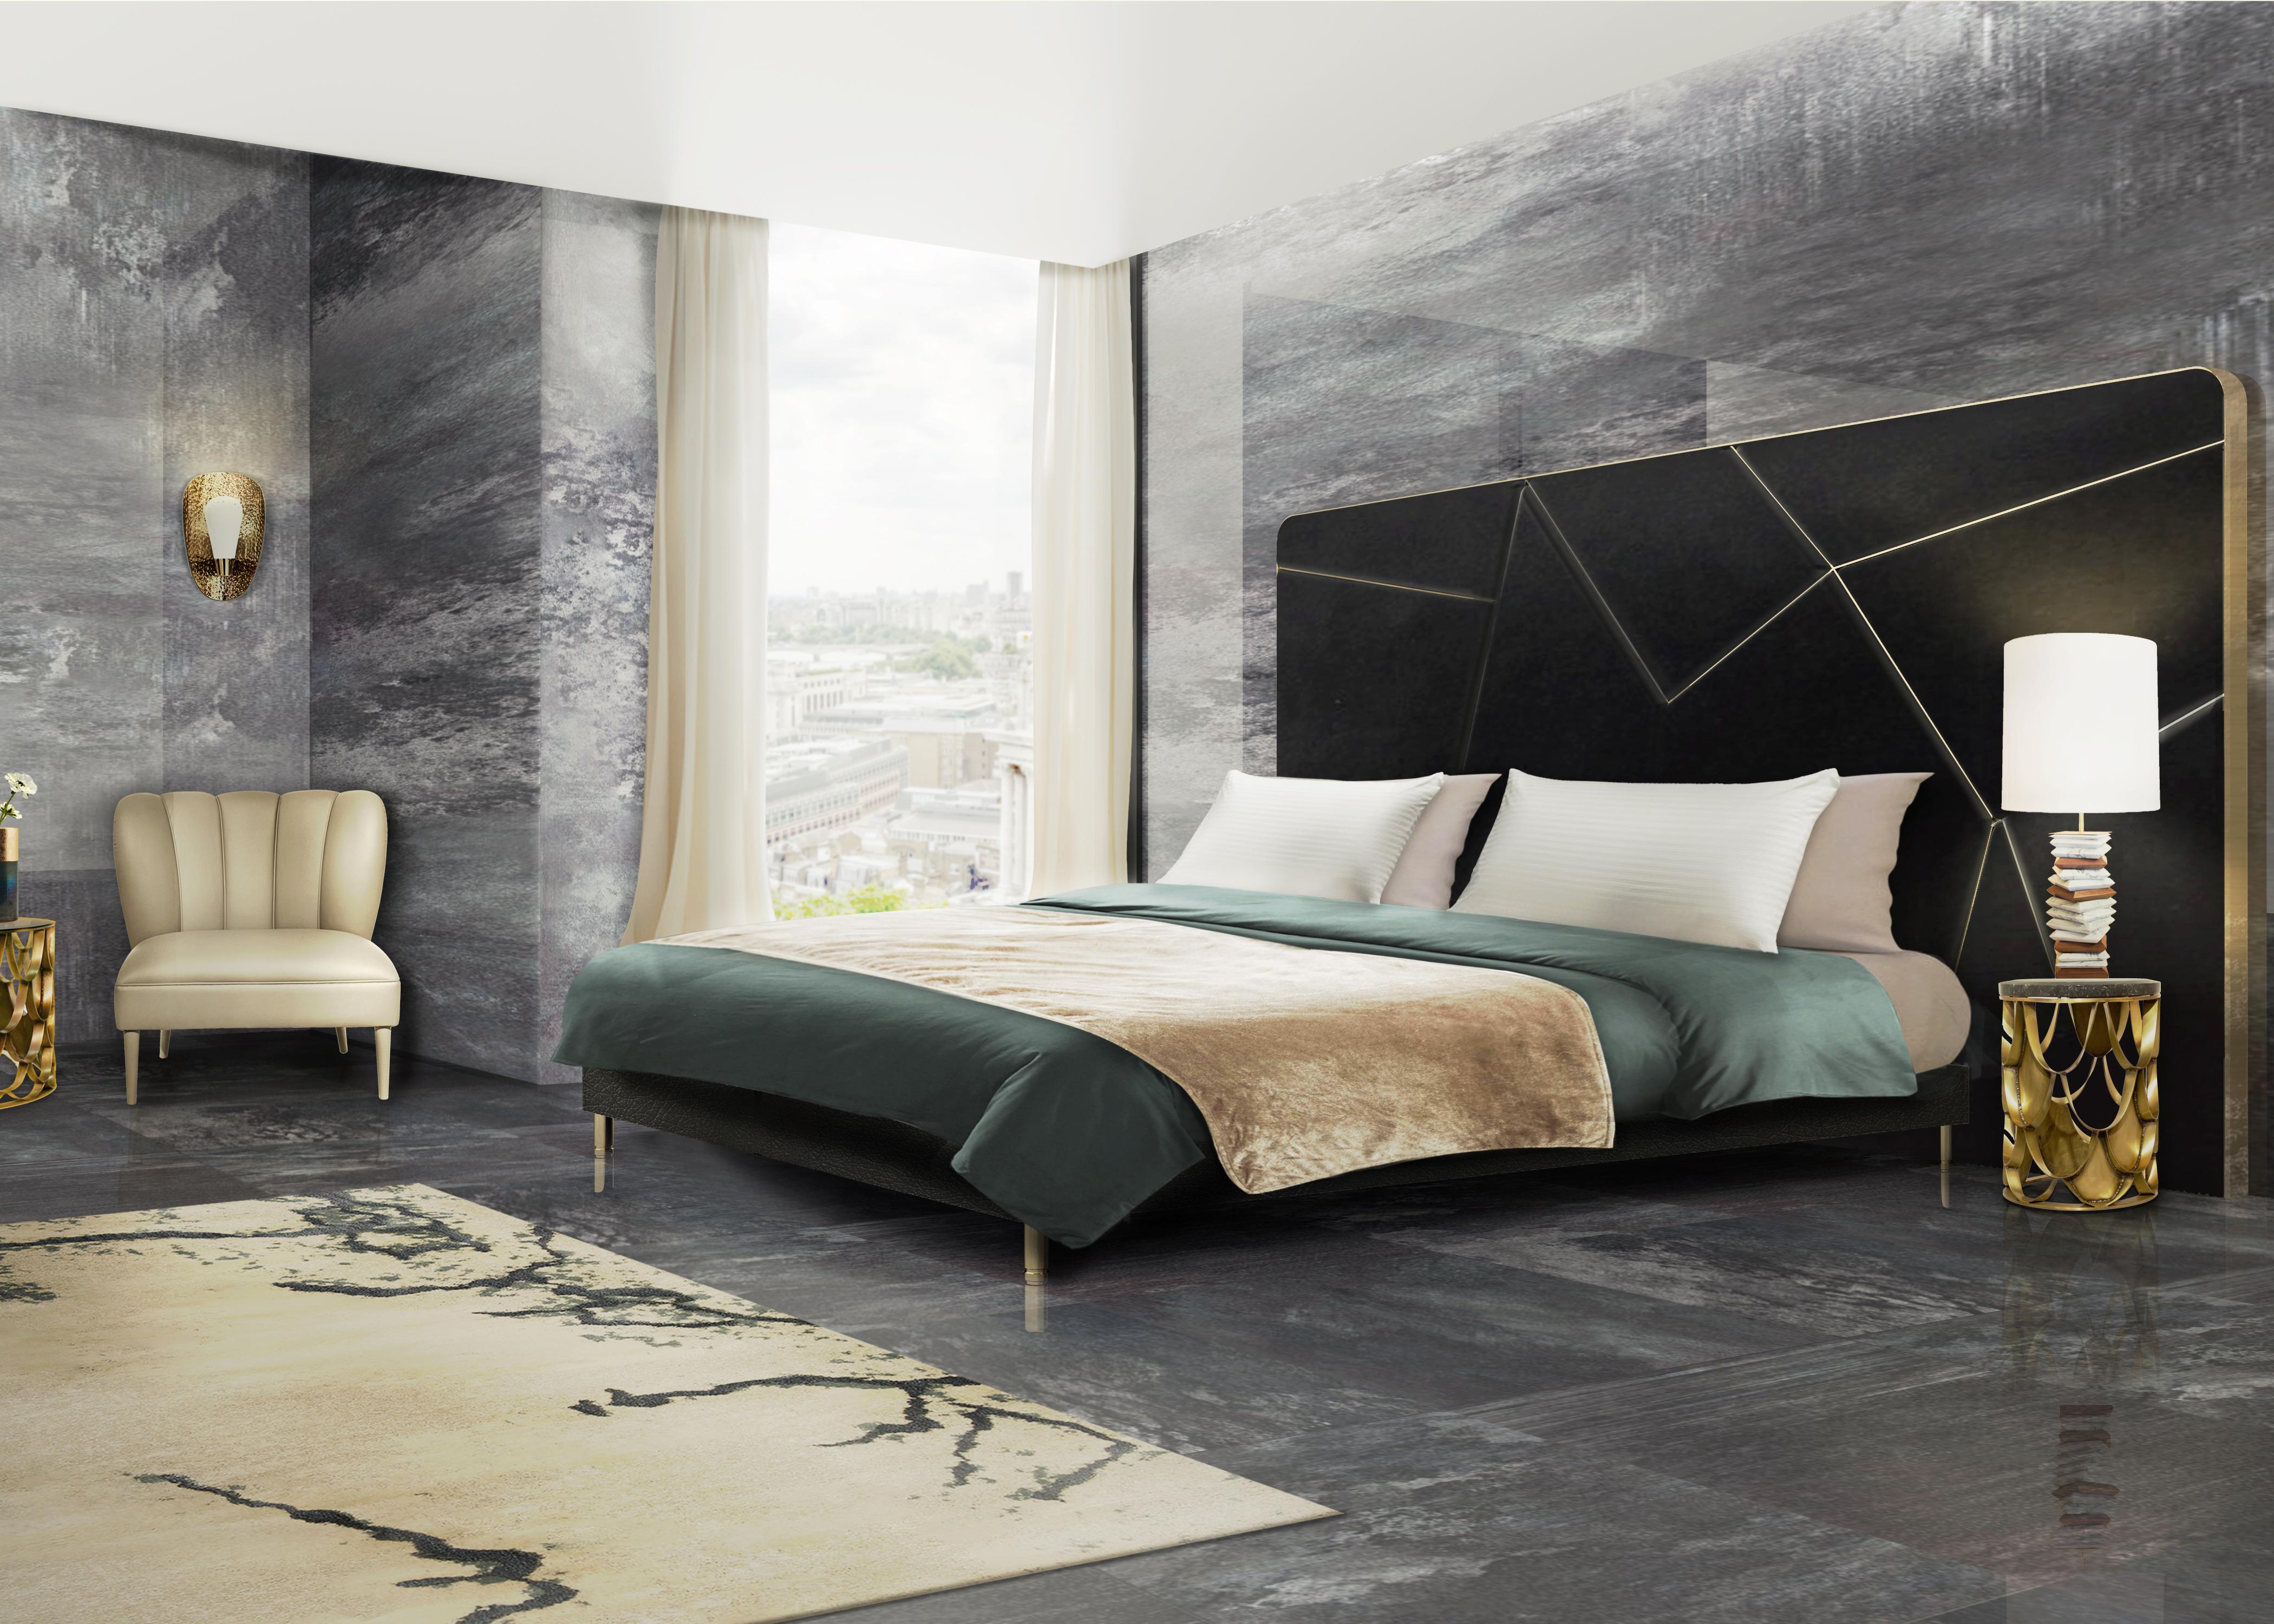 Most popular hotel bedroom_4 most popular hotel bedroom Most popular hotel bedroom pinterest – Trends 2017 Hotel brabbu project 9 HR